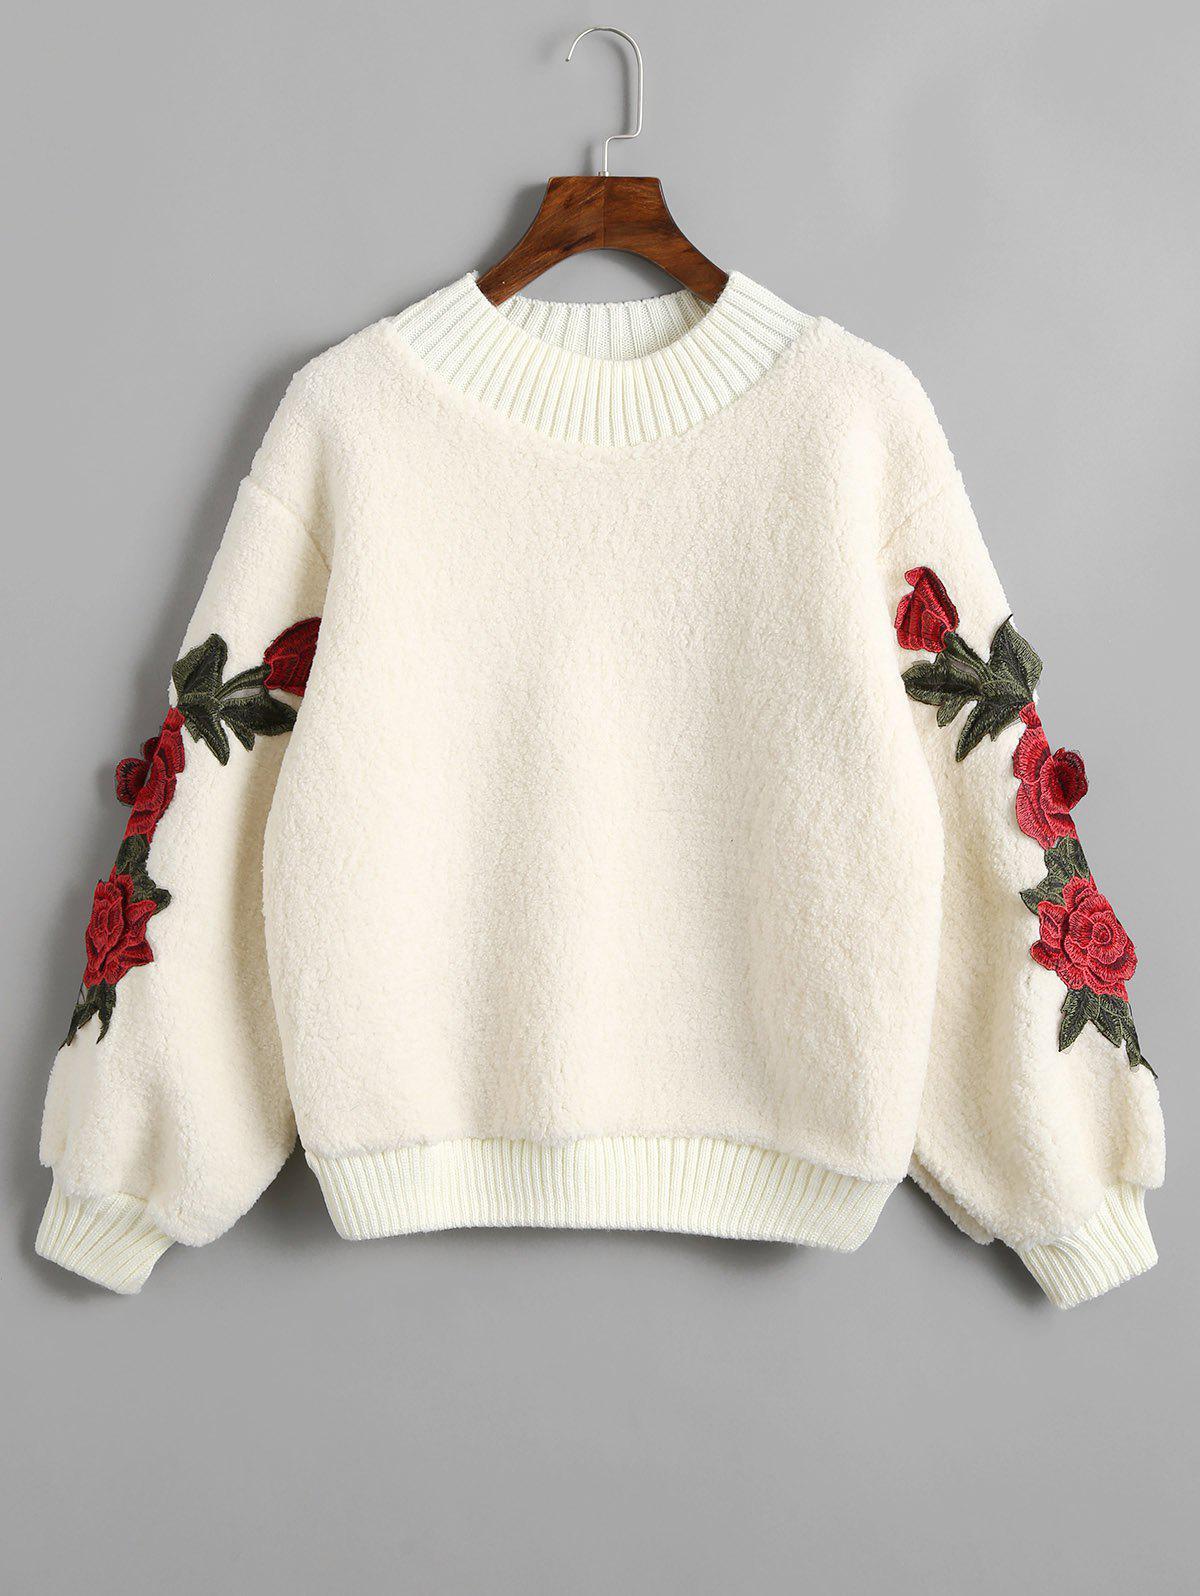 Floral Appliques Ribbed Hem Shearling Sweatshirt 237379901